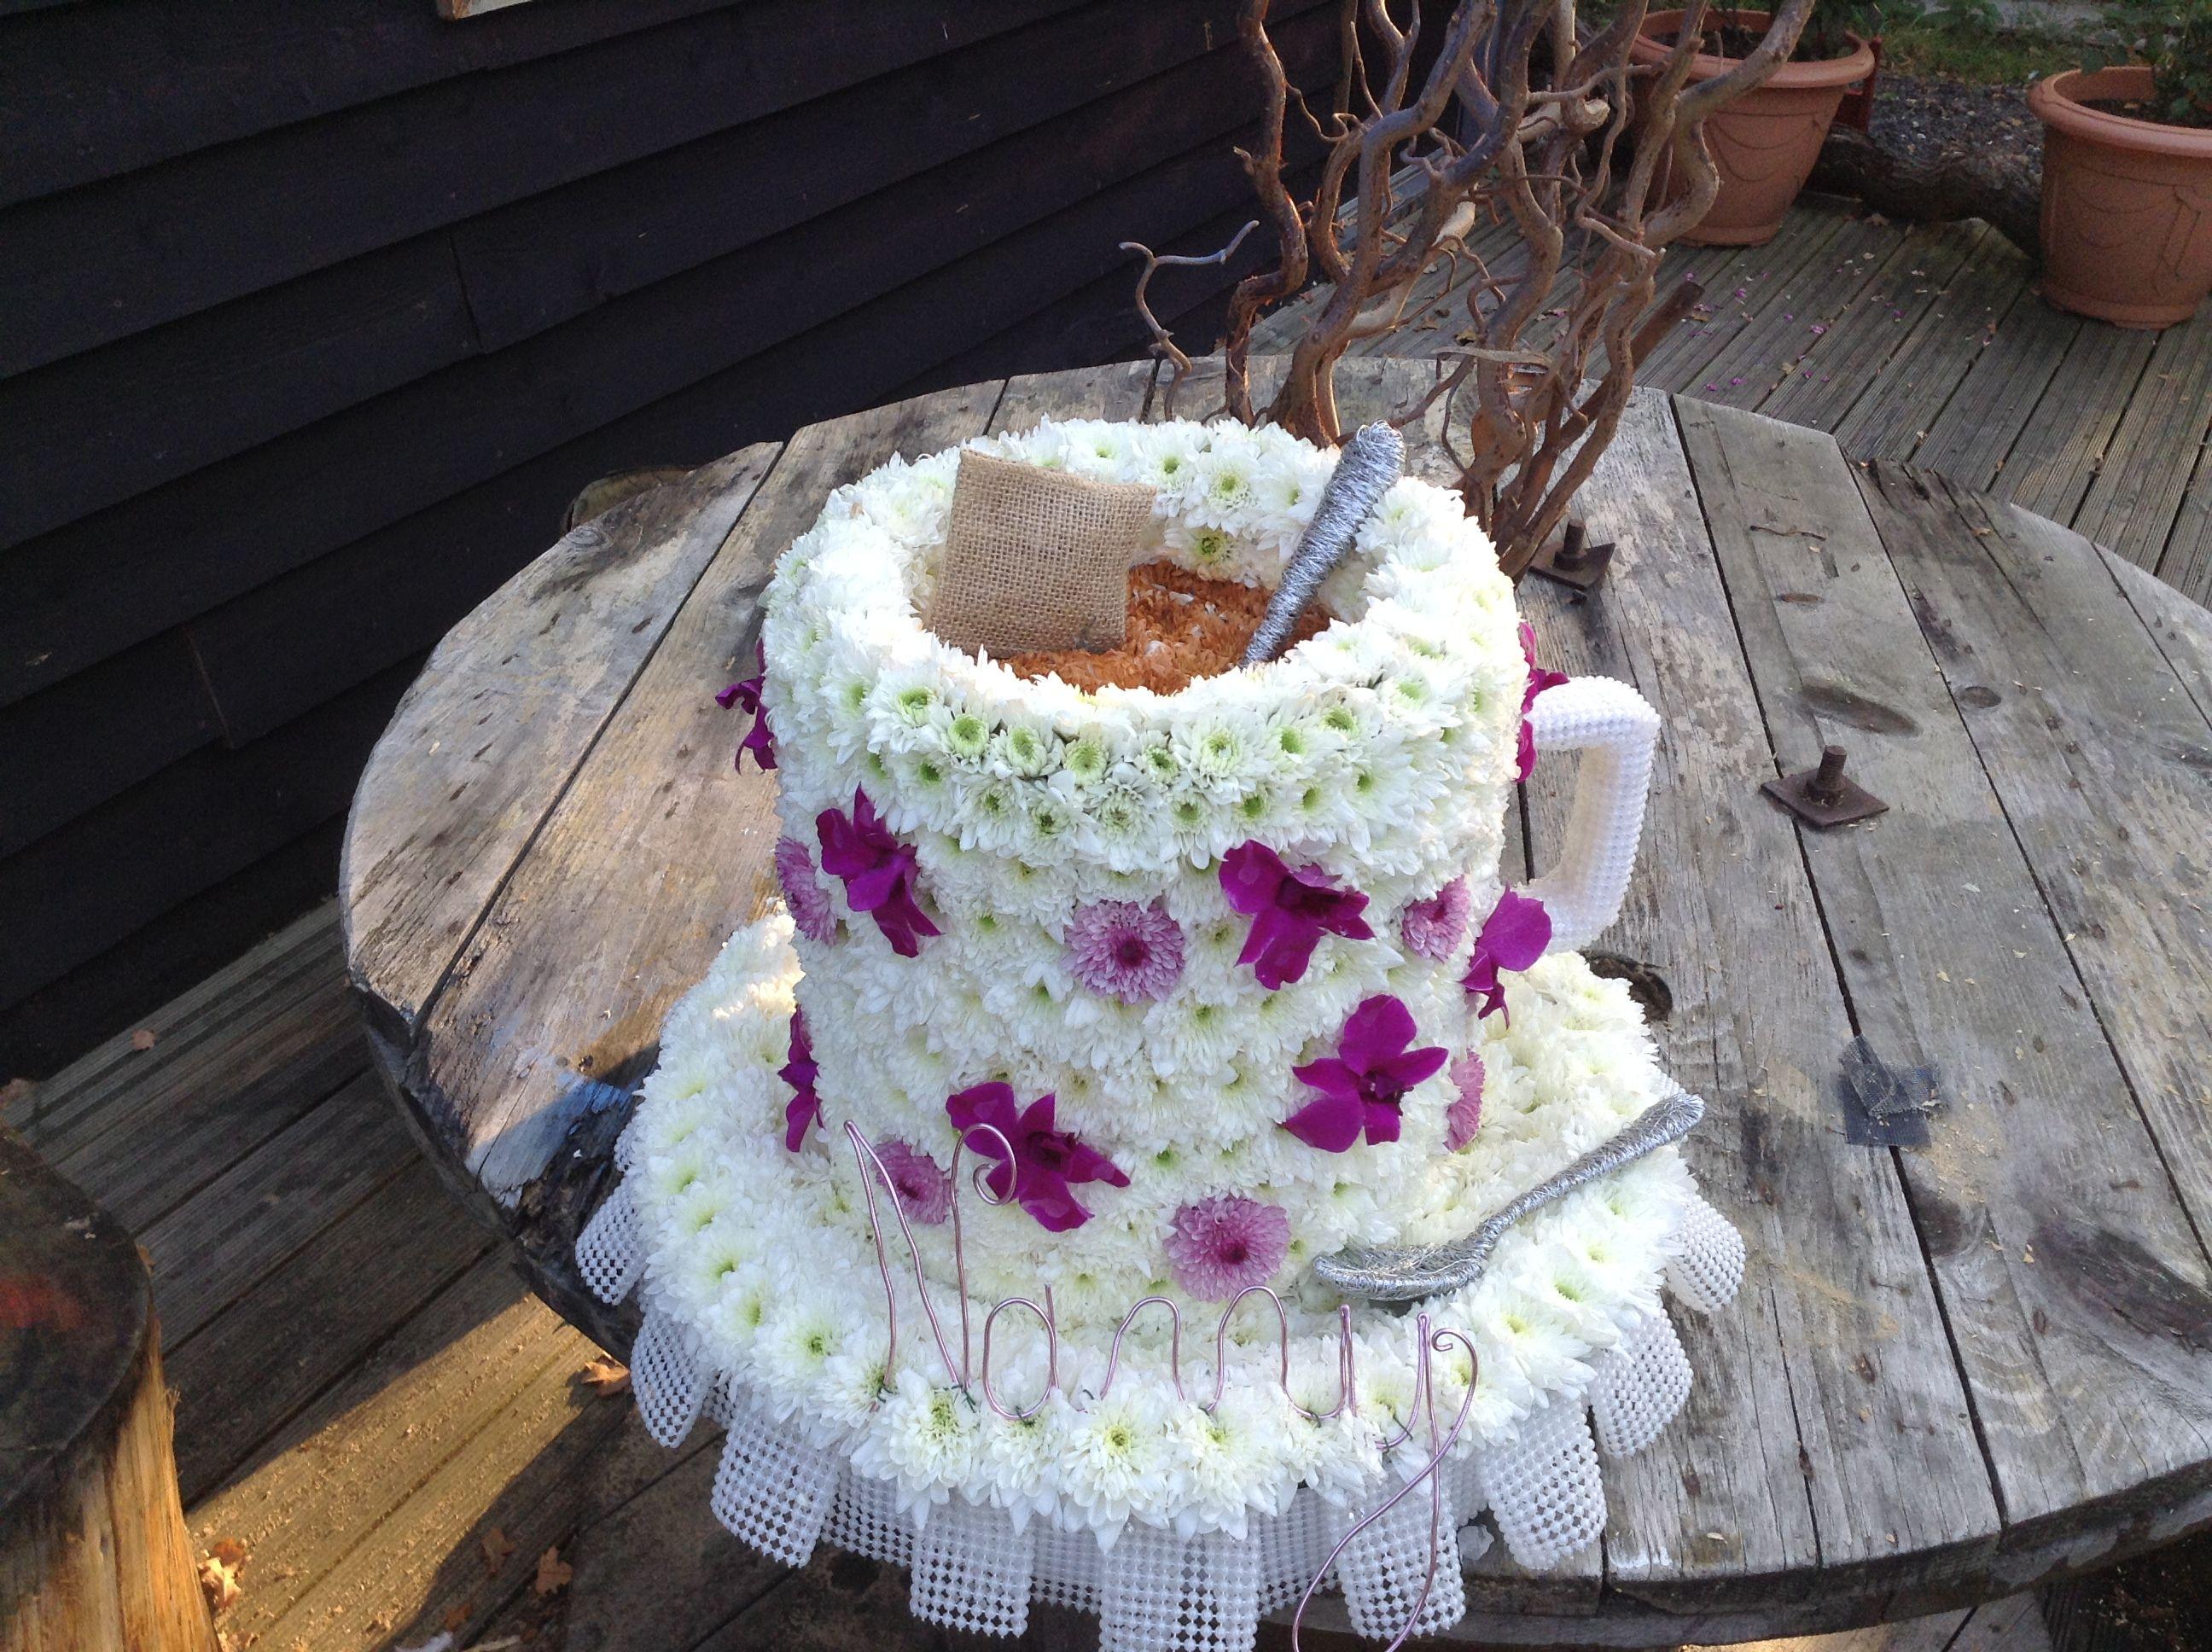 Best 10 funeral flowers uk ideas on pinterest flowers for cupmug of tea funeral flower tribute bespoke funeral flower tributes unusual funeral dhlflorist Gallery